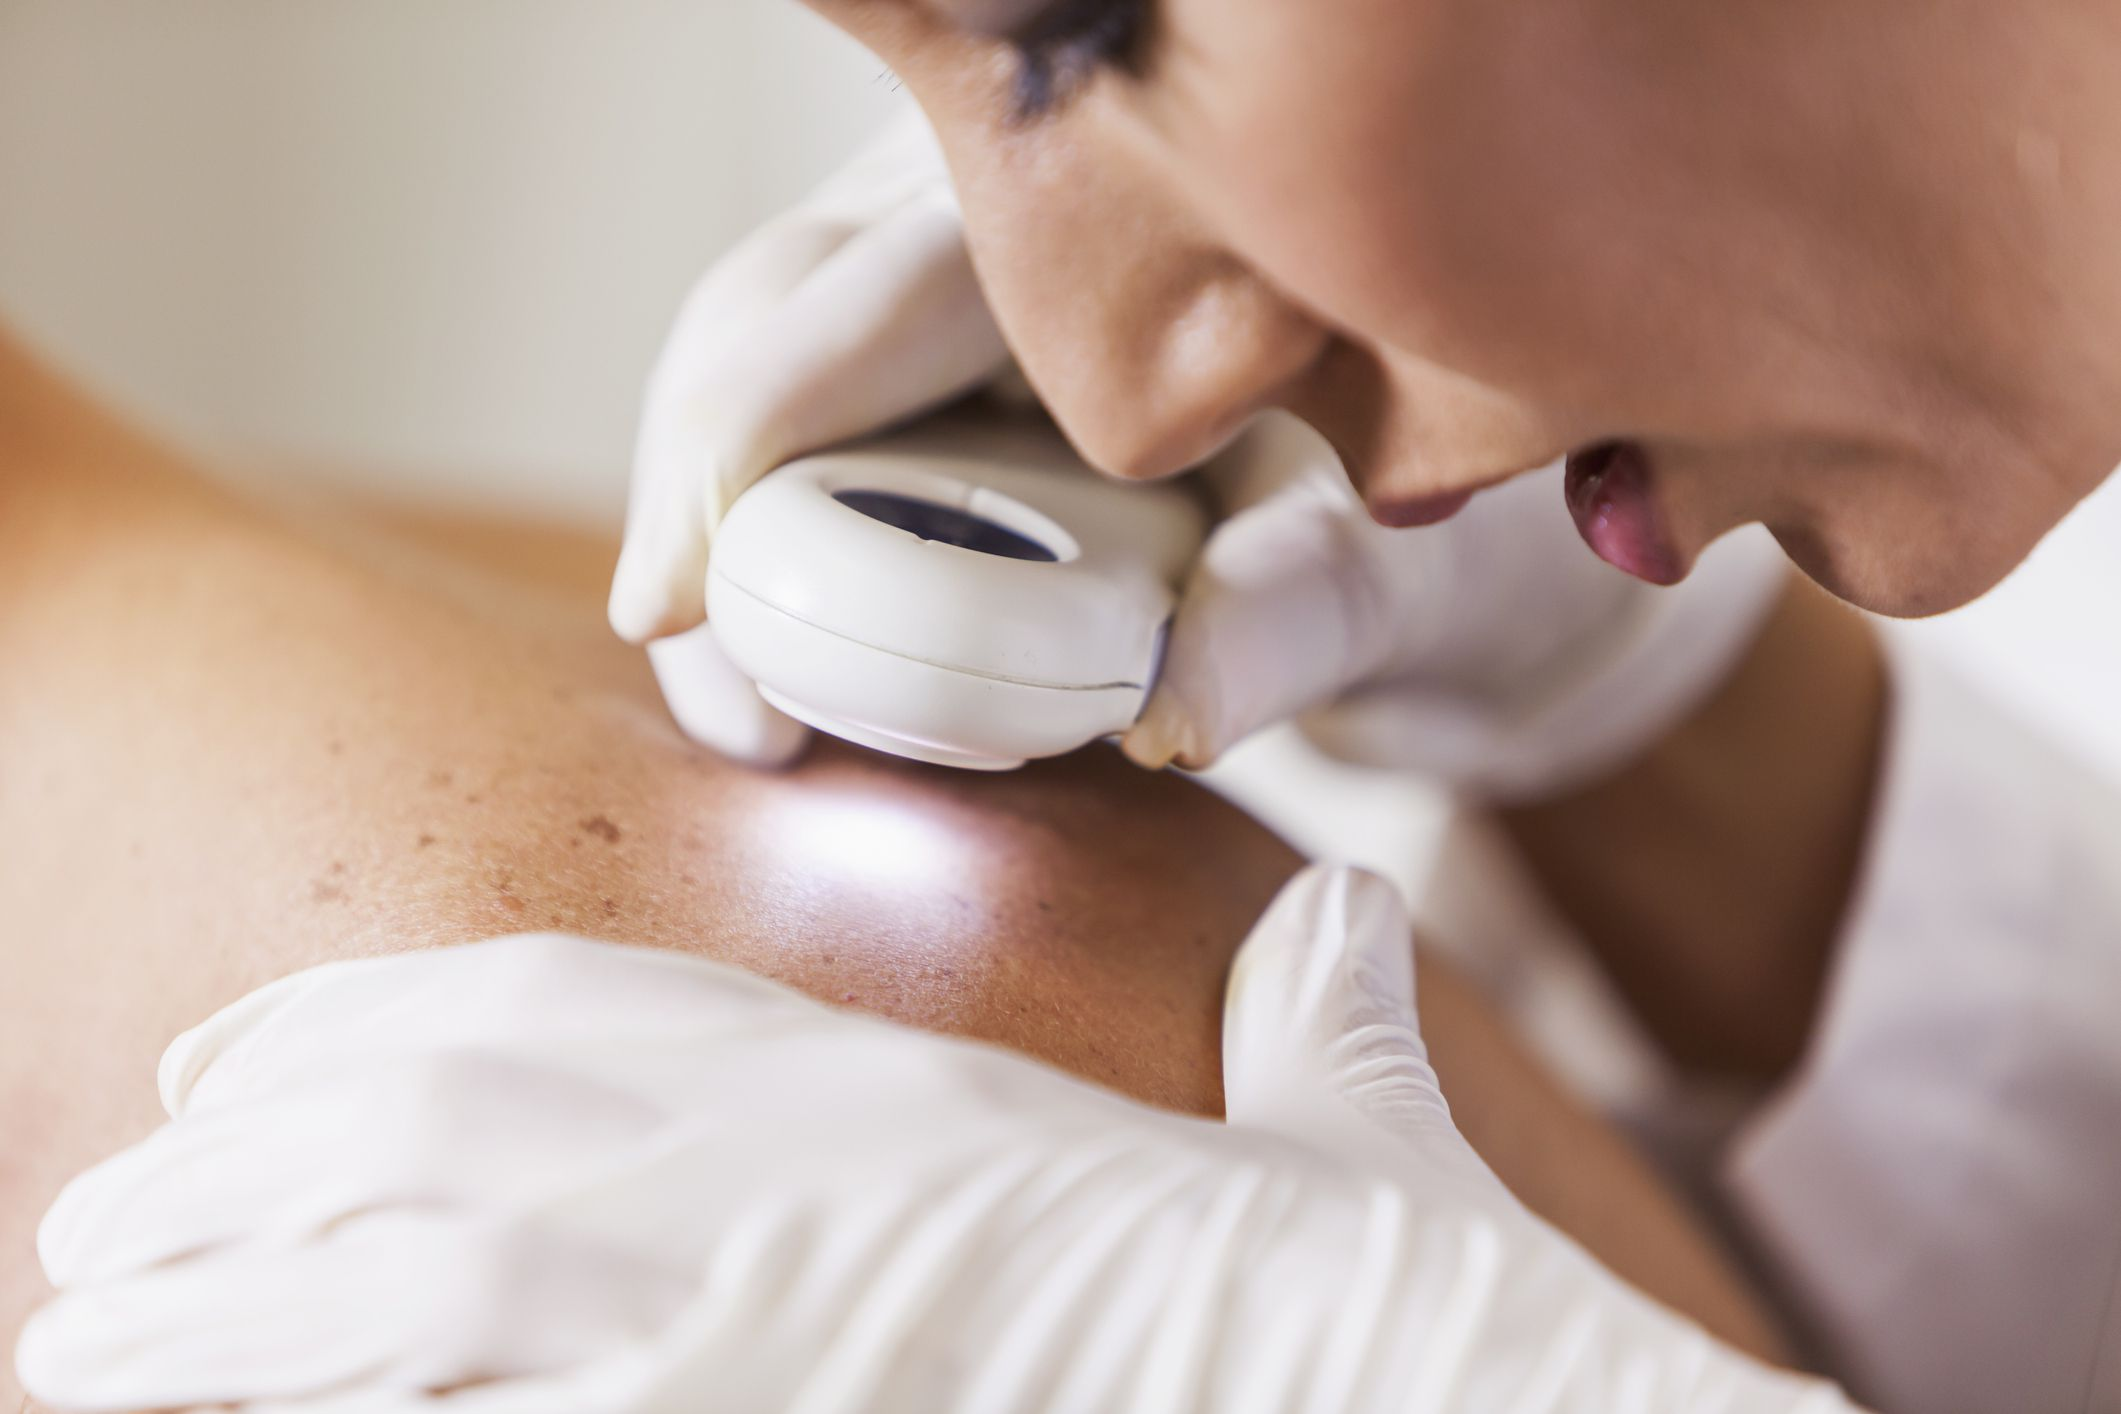 Doctor exam for skin cancer